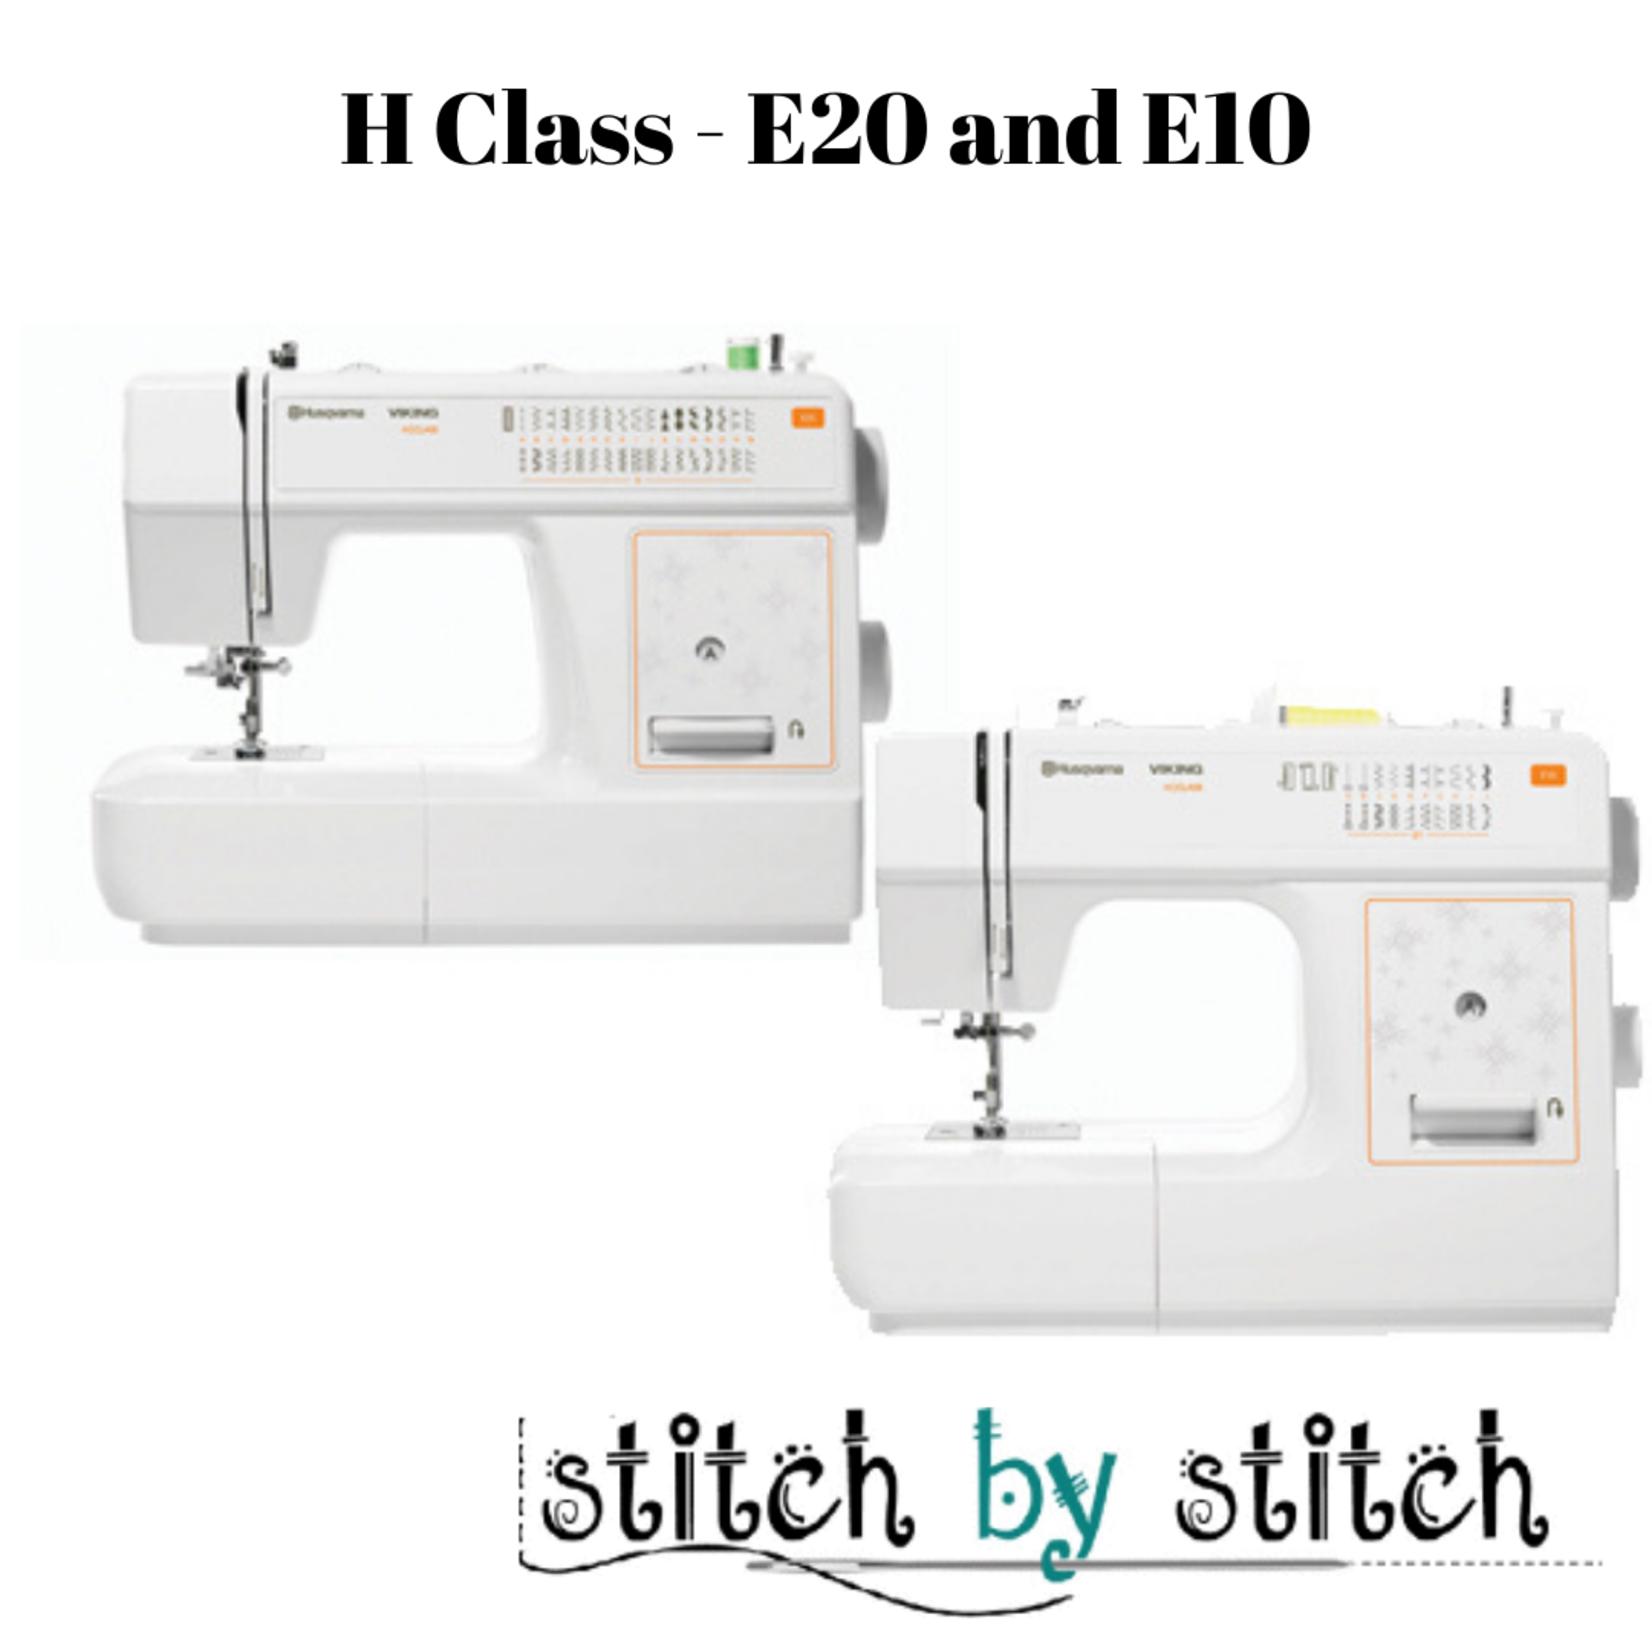 HUSQVARNA VIKING H CLASS™ E20